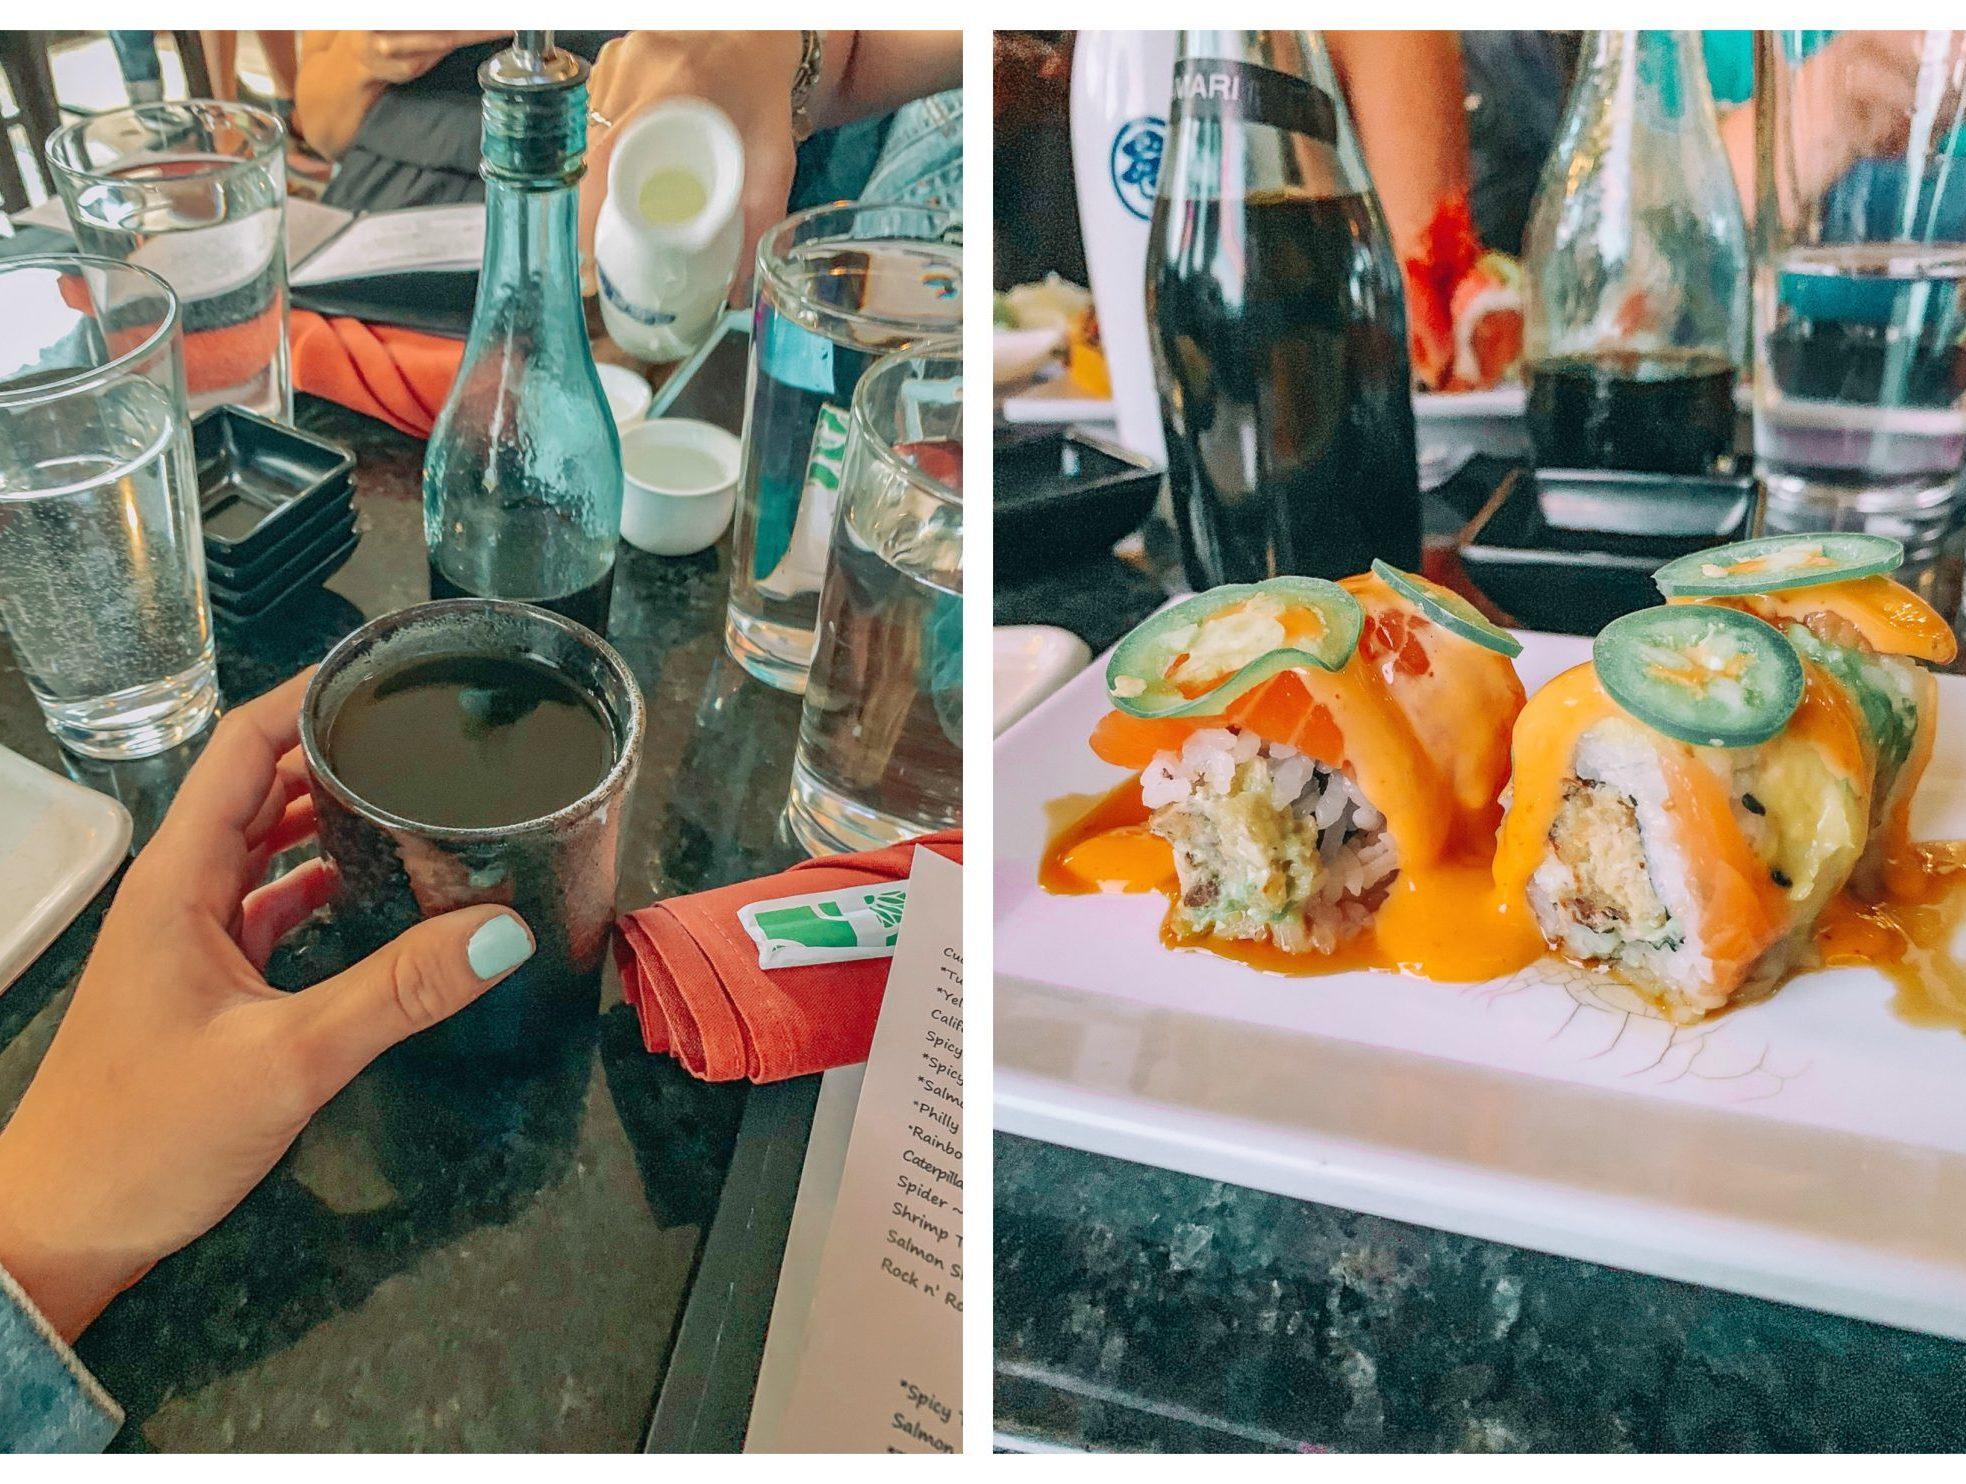 Lake Tahoe South, Travel Blog, Simply Taralynn, Travel Blogger, Traveling, Blog, Travel, Mountains, Edgewood Bistro, California, Nevada, Summer, Trips, Traveling to Tahoe, Lake Tahoe, Where to eat, drink, stay, boating, see, things to do in Lake Tahoe, summer in lake tahoe, sushi, naked fish, gluten free, dairy free, allergy friendly, vegan, vegetarian, options,